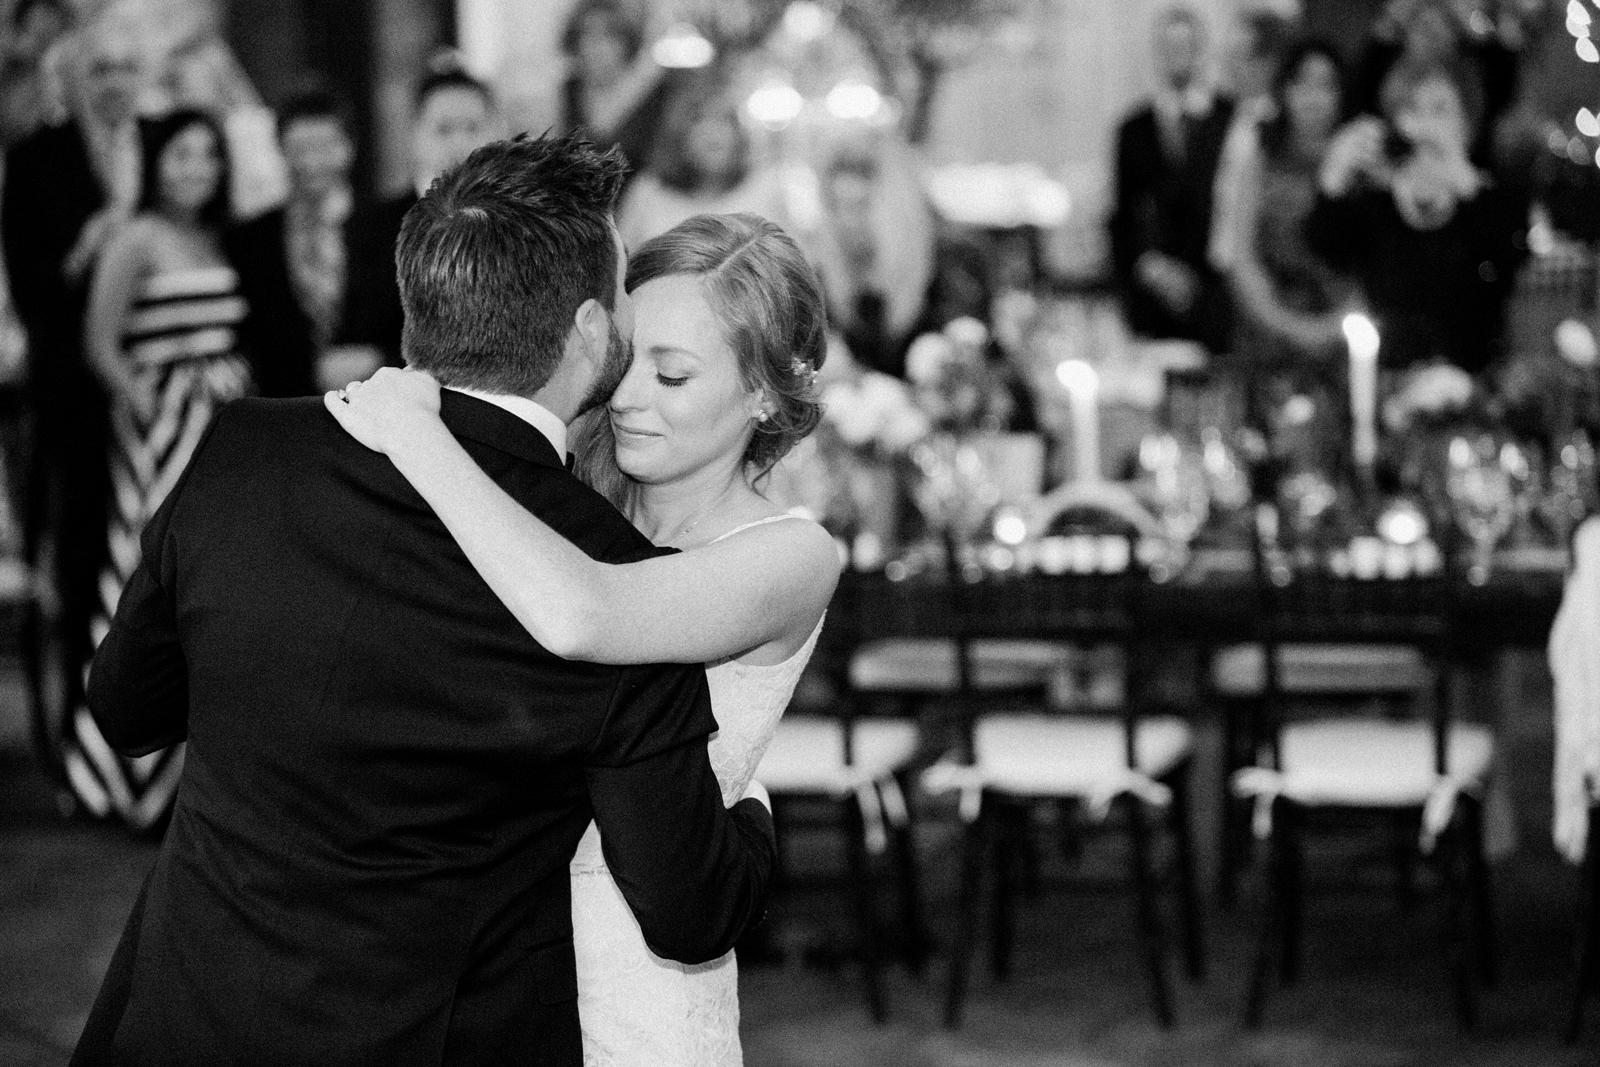 old_edwards_inn_wedding_Natalie_watson_photography_085.jpg